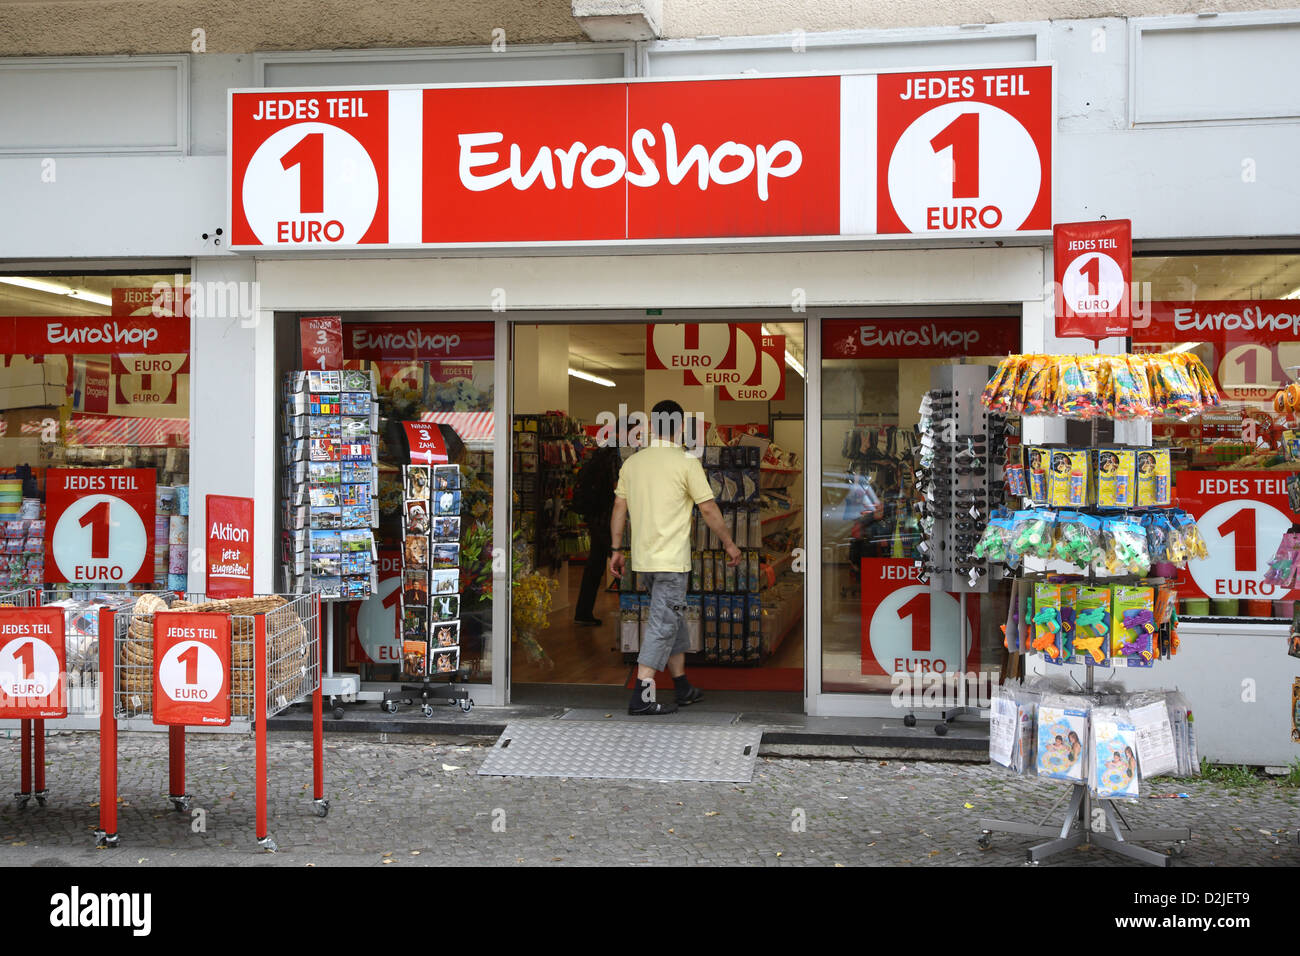 berlin germany a man walks into a euro shop stock photo 53267209 alamy